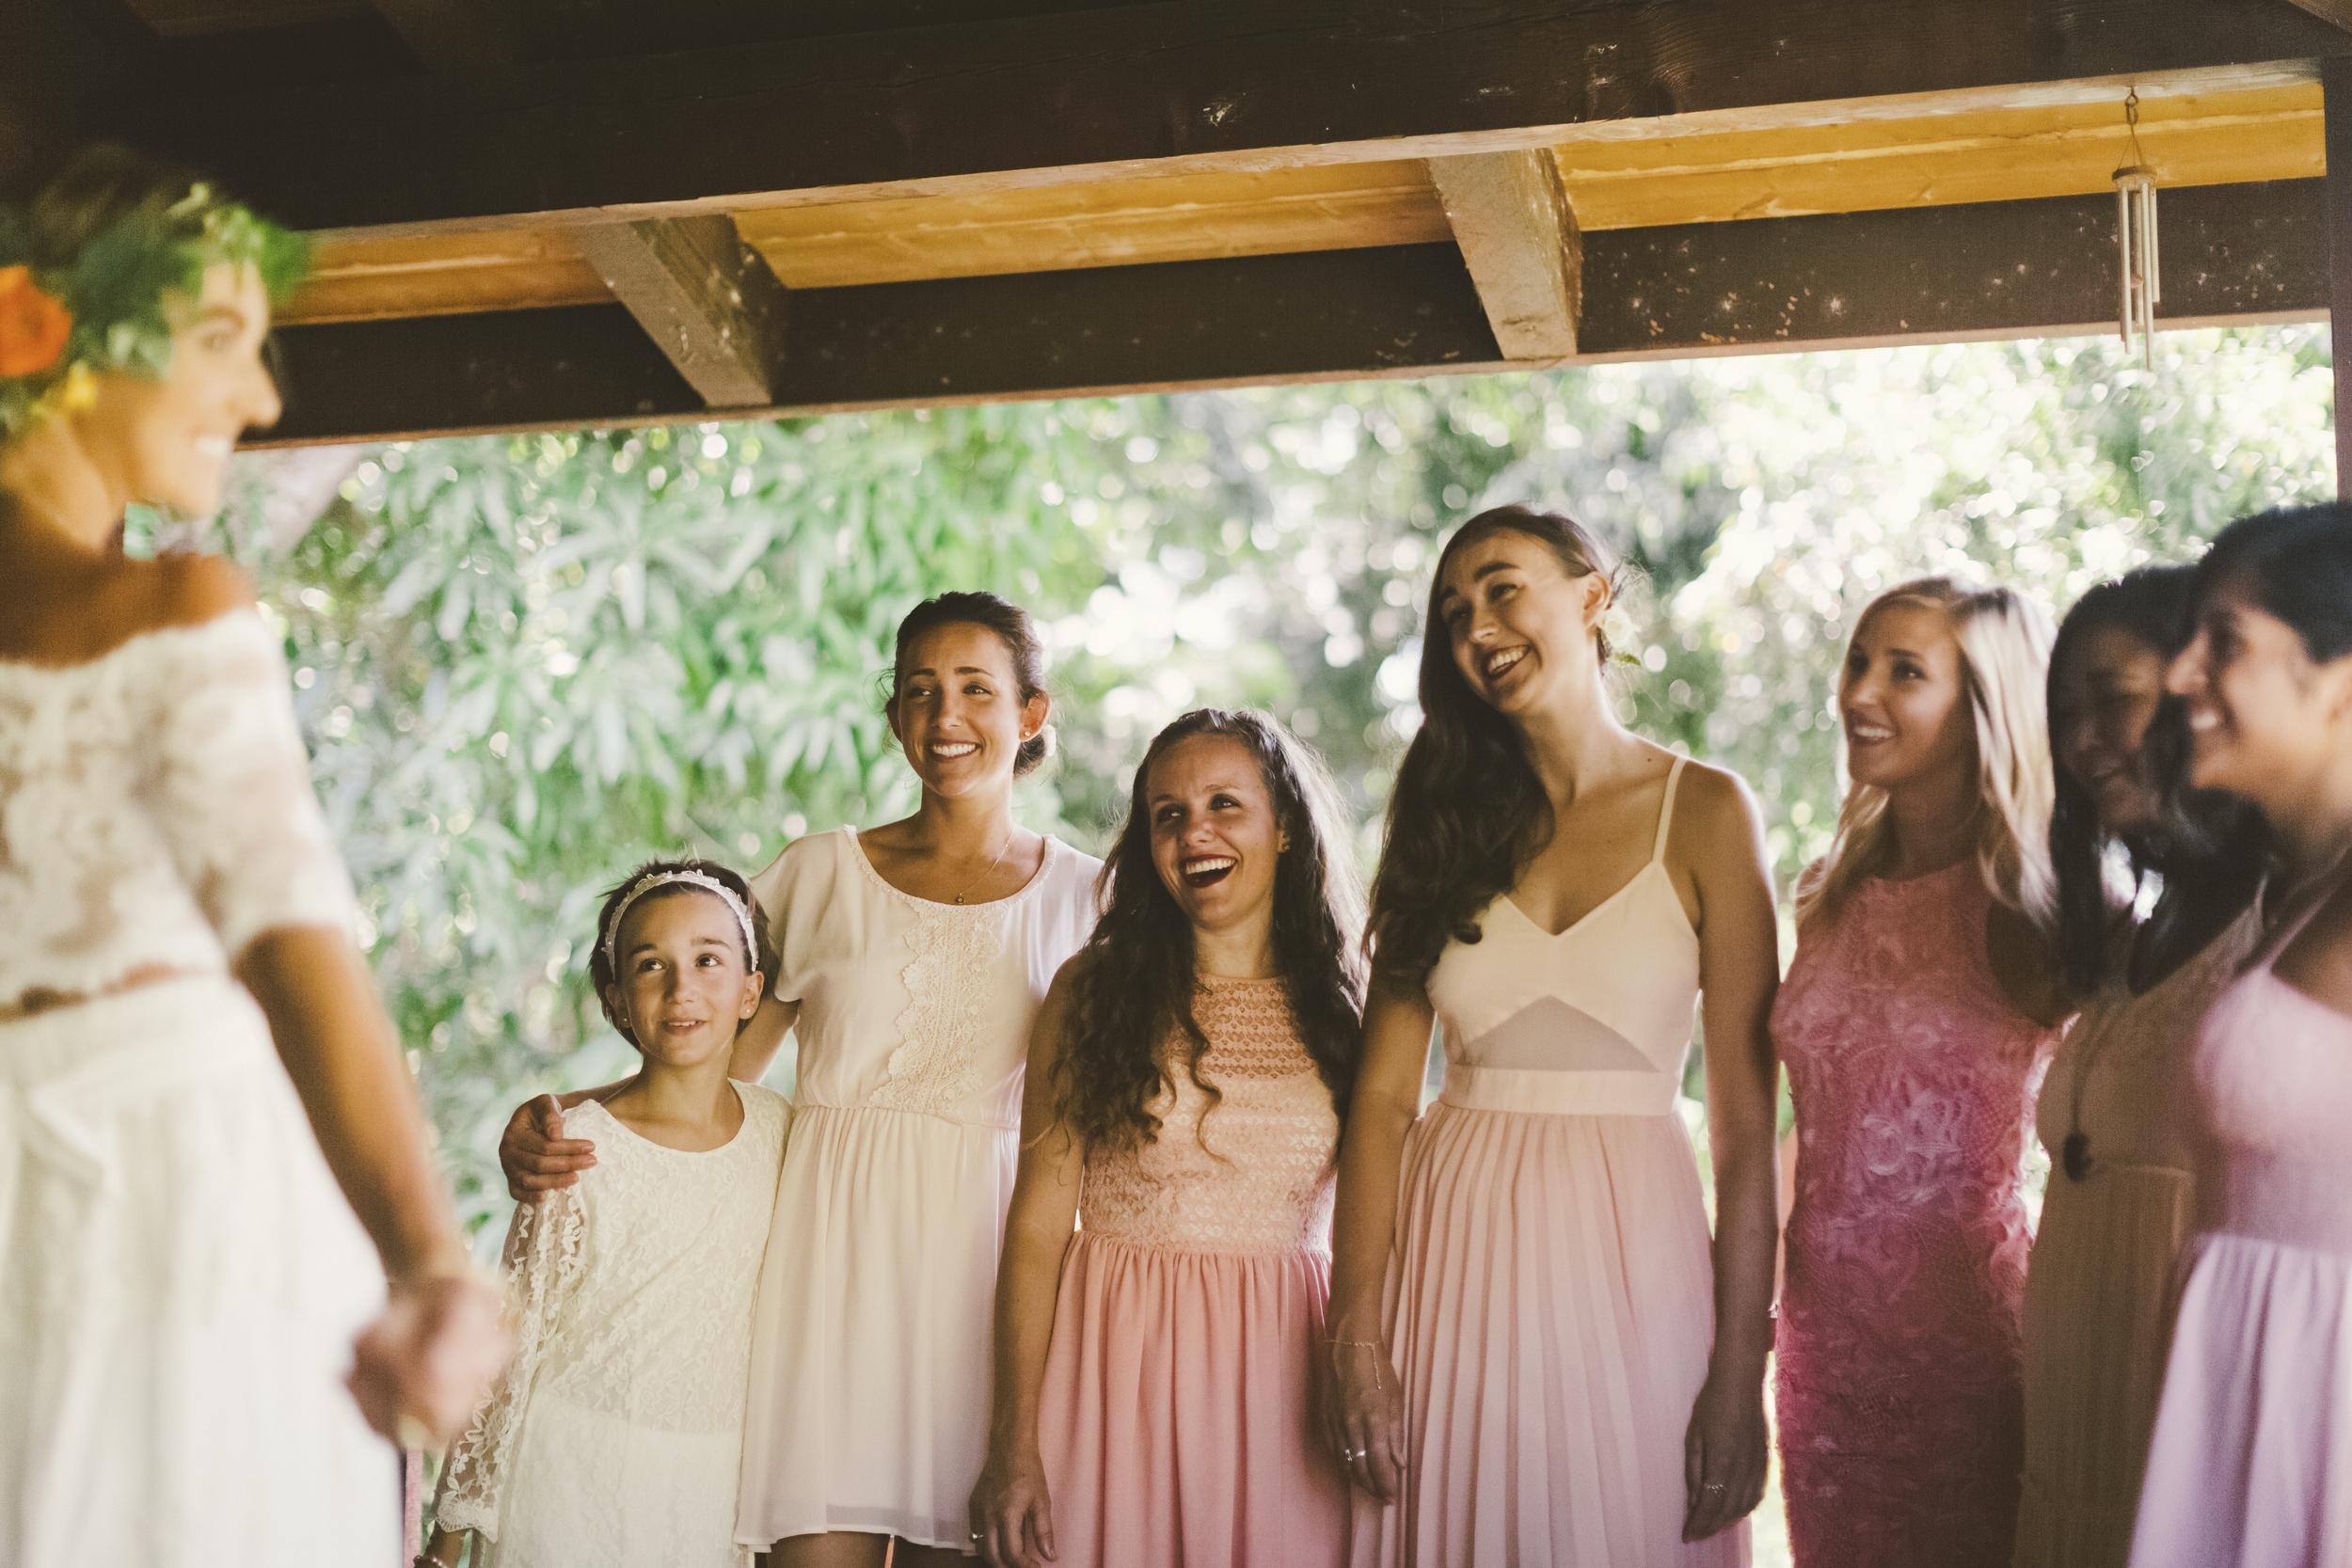 angie-diaz-photography-oahu-hawaii-wedding-tradewinds-ranch-18.jpg